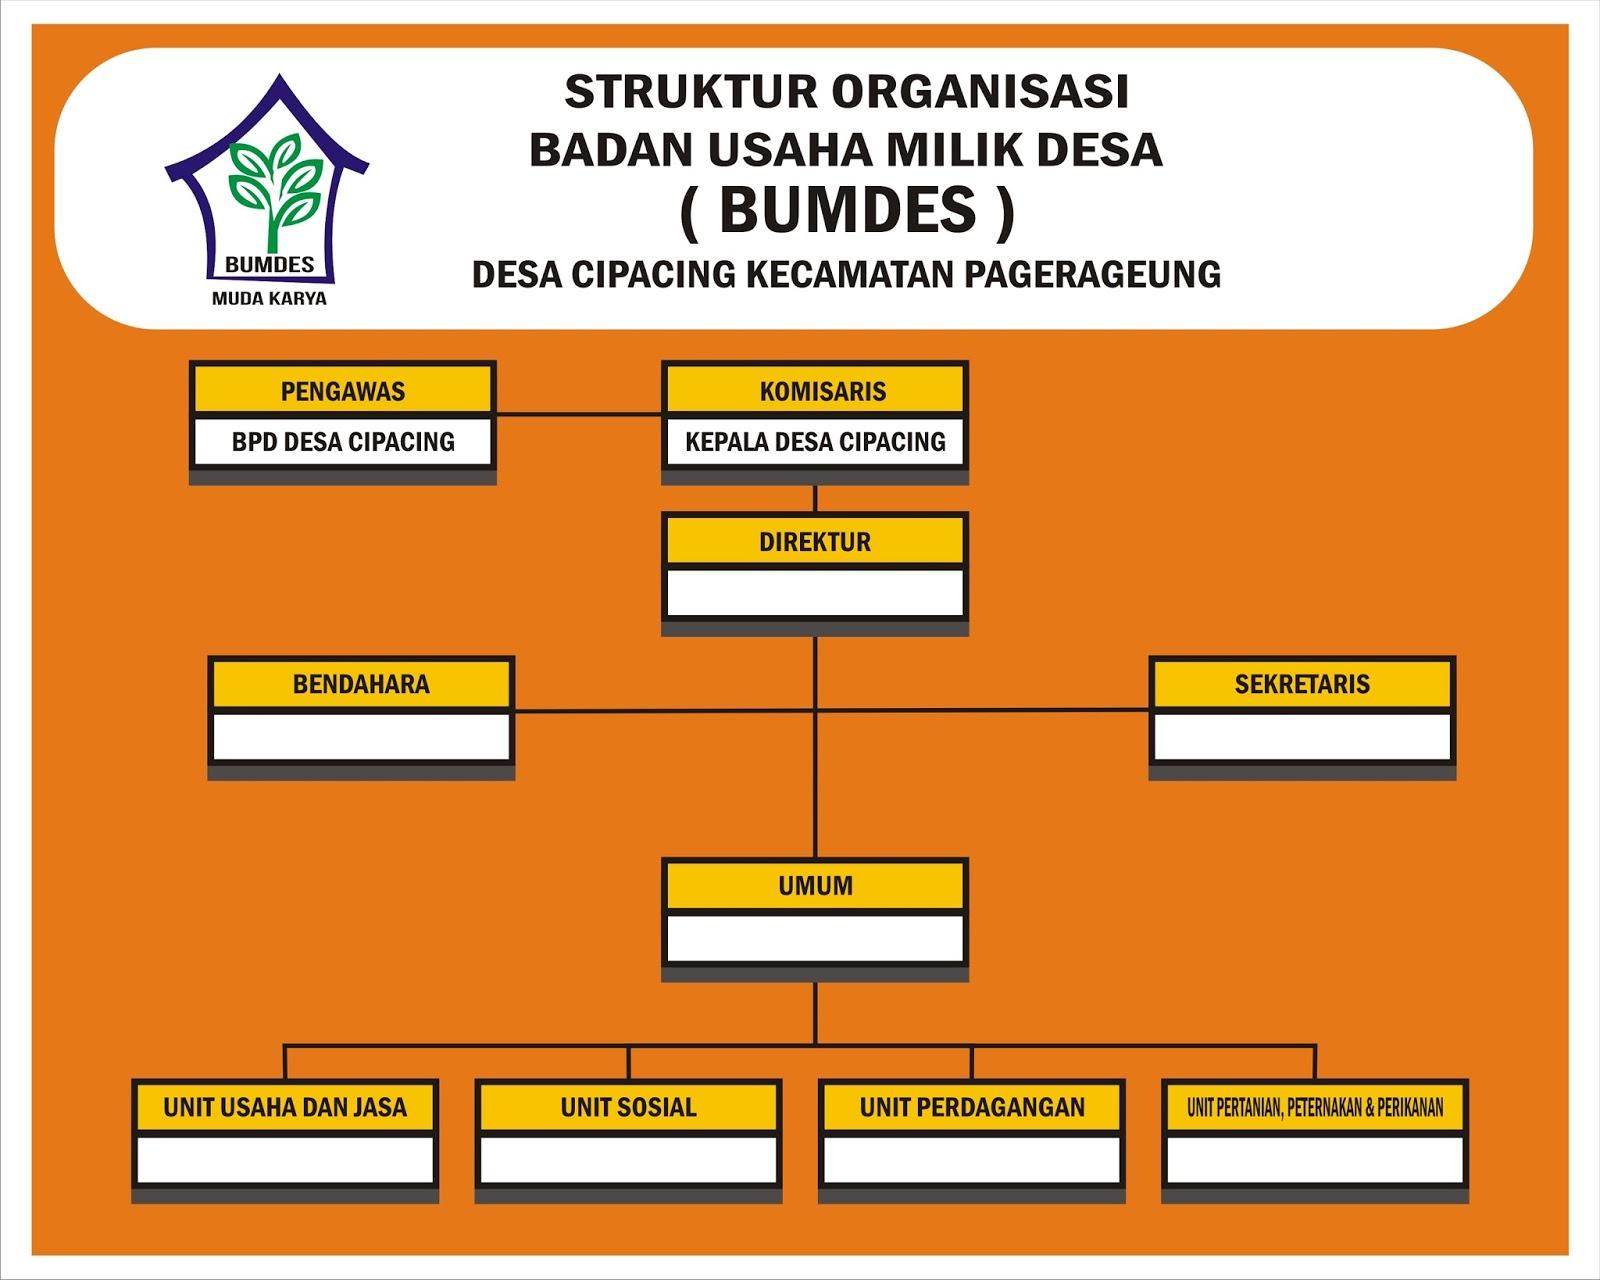 Contoh Baliho Struktur Organisasi - desain banner kekinian